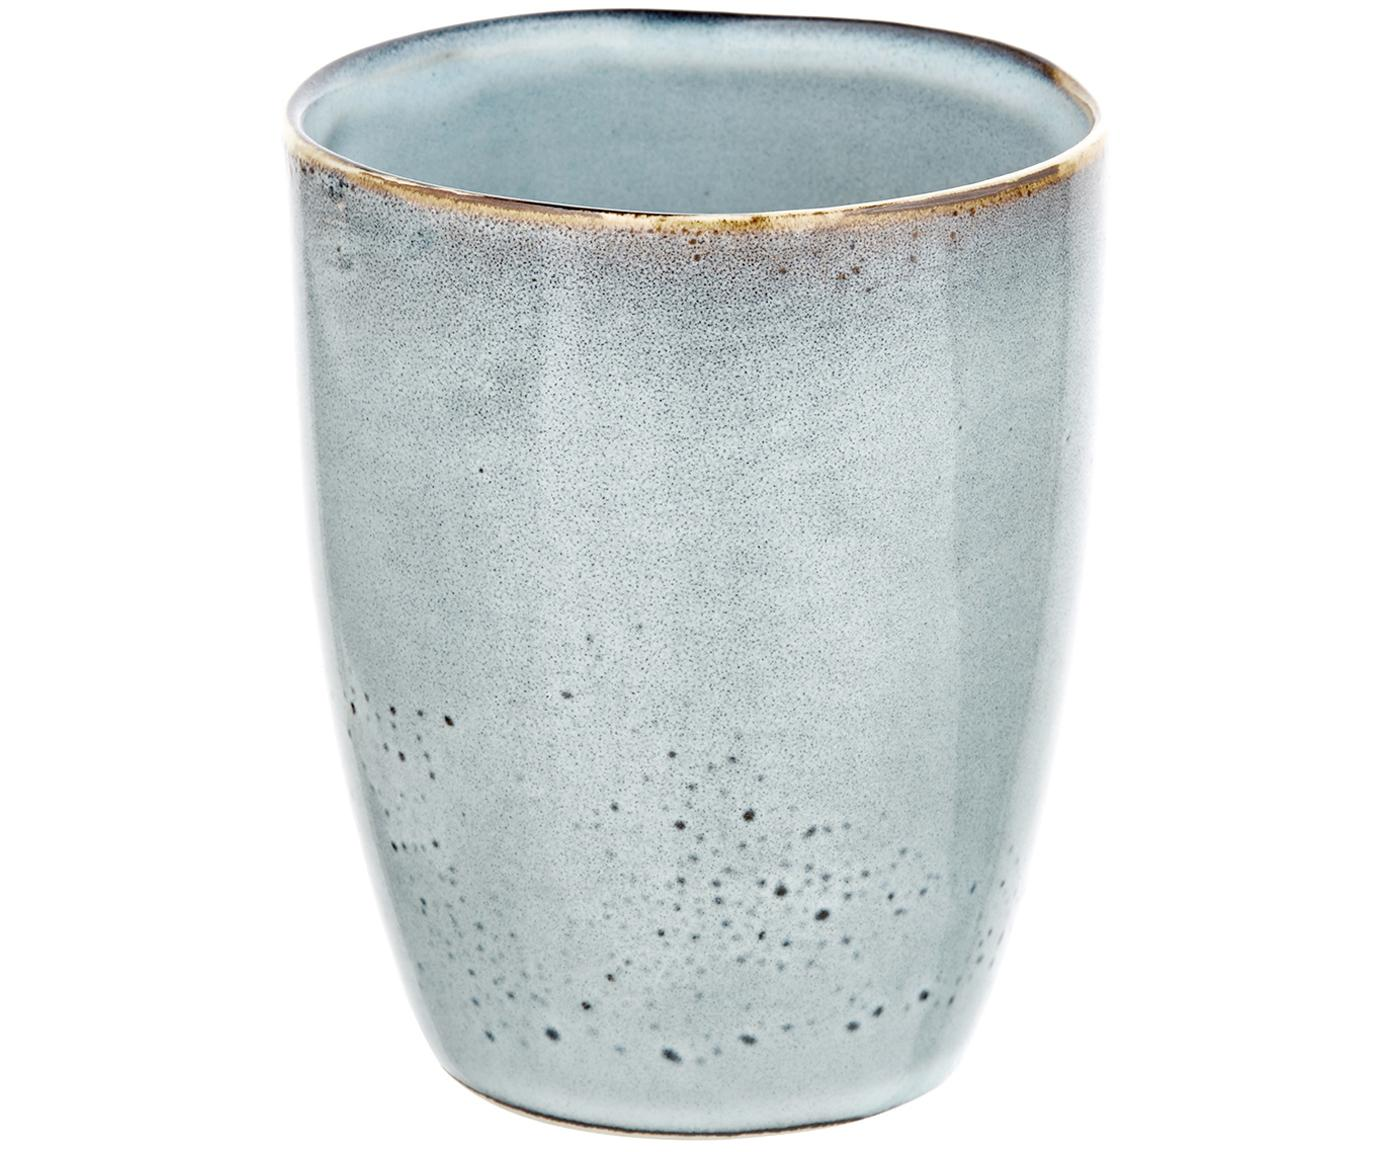 Handgemachte Becher Thalia in Blaugrau, 2 Stück, Steinzeug, Blaugrau, Ø 9 x H 11 cm